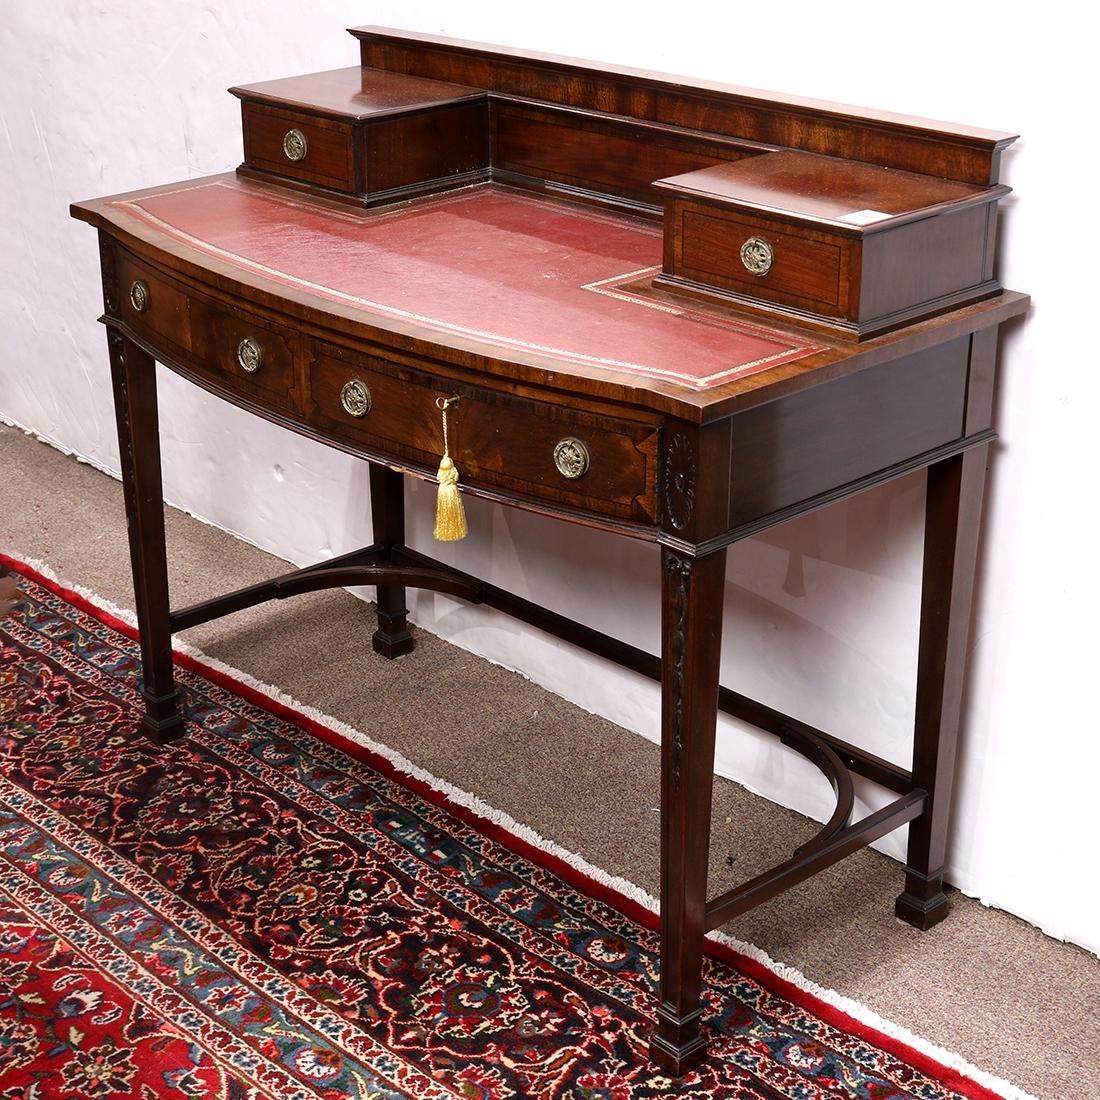 Regency ladies writing desk circa 1820